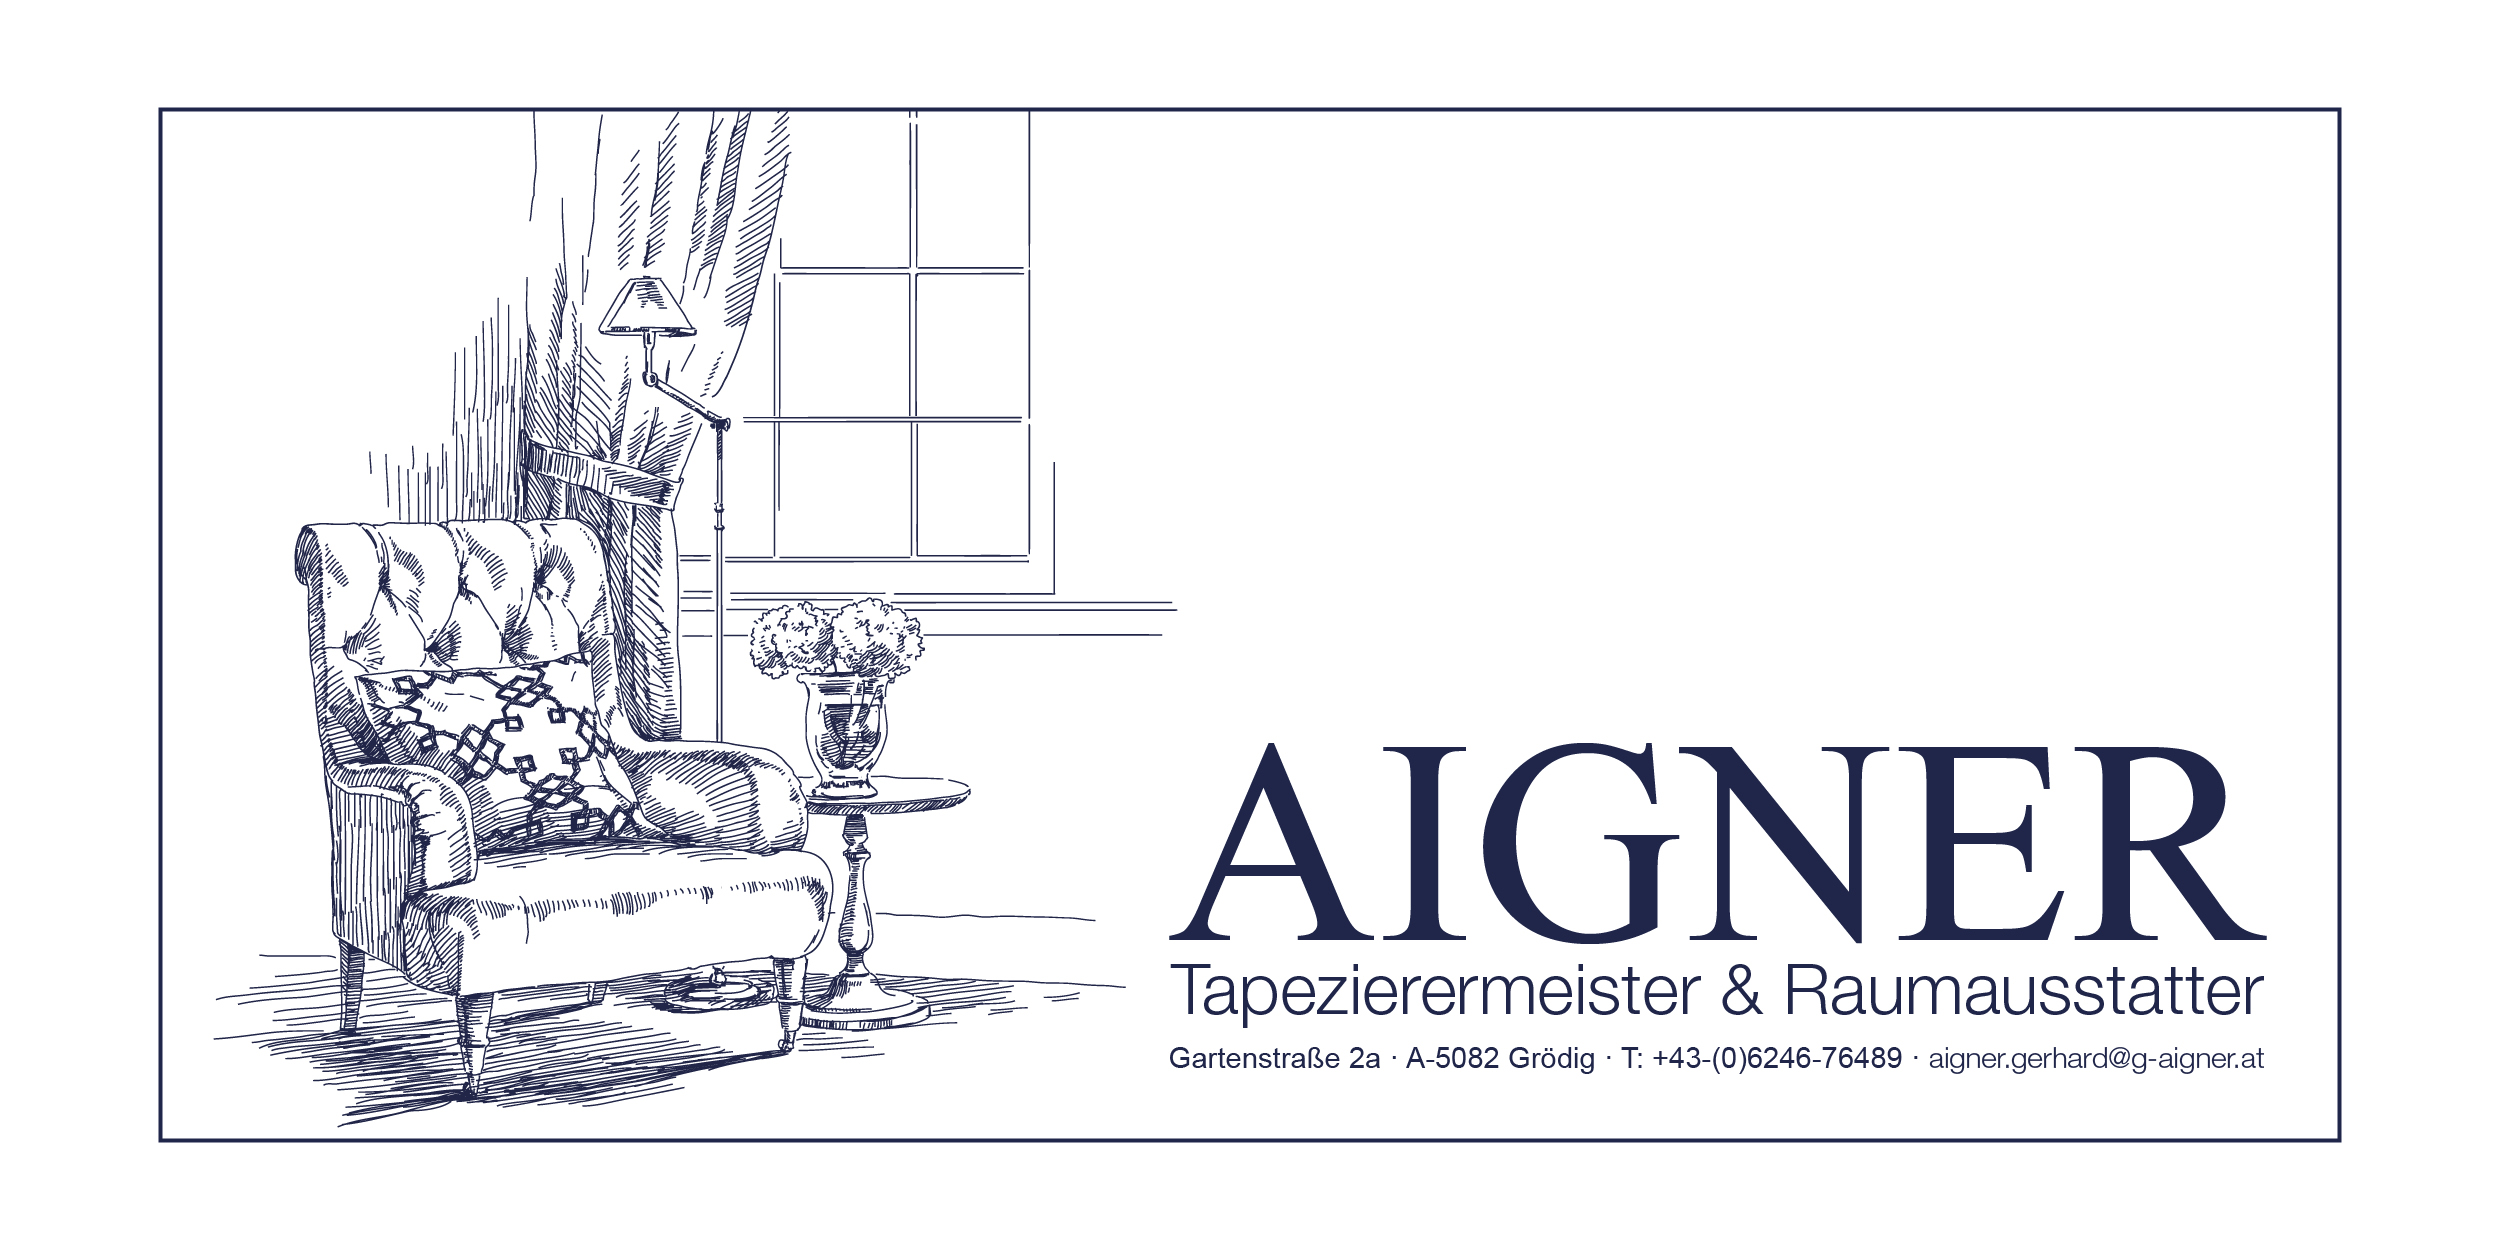 SVG Sponsor - Aigner GmbH